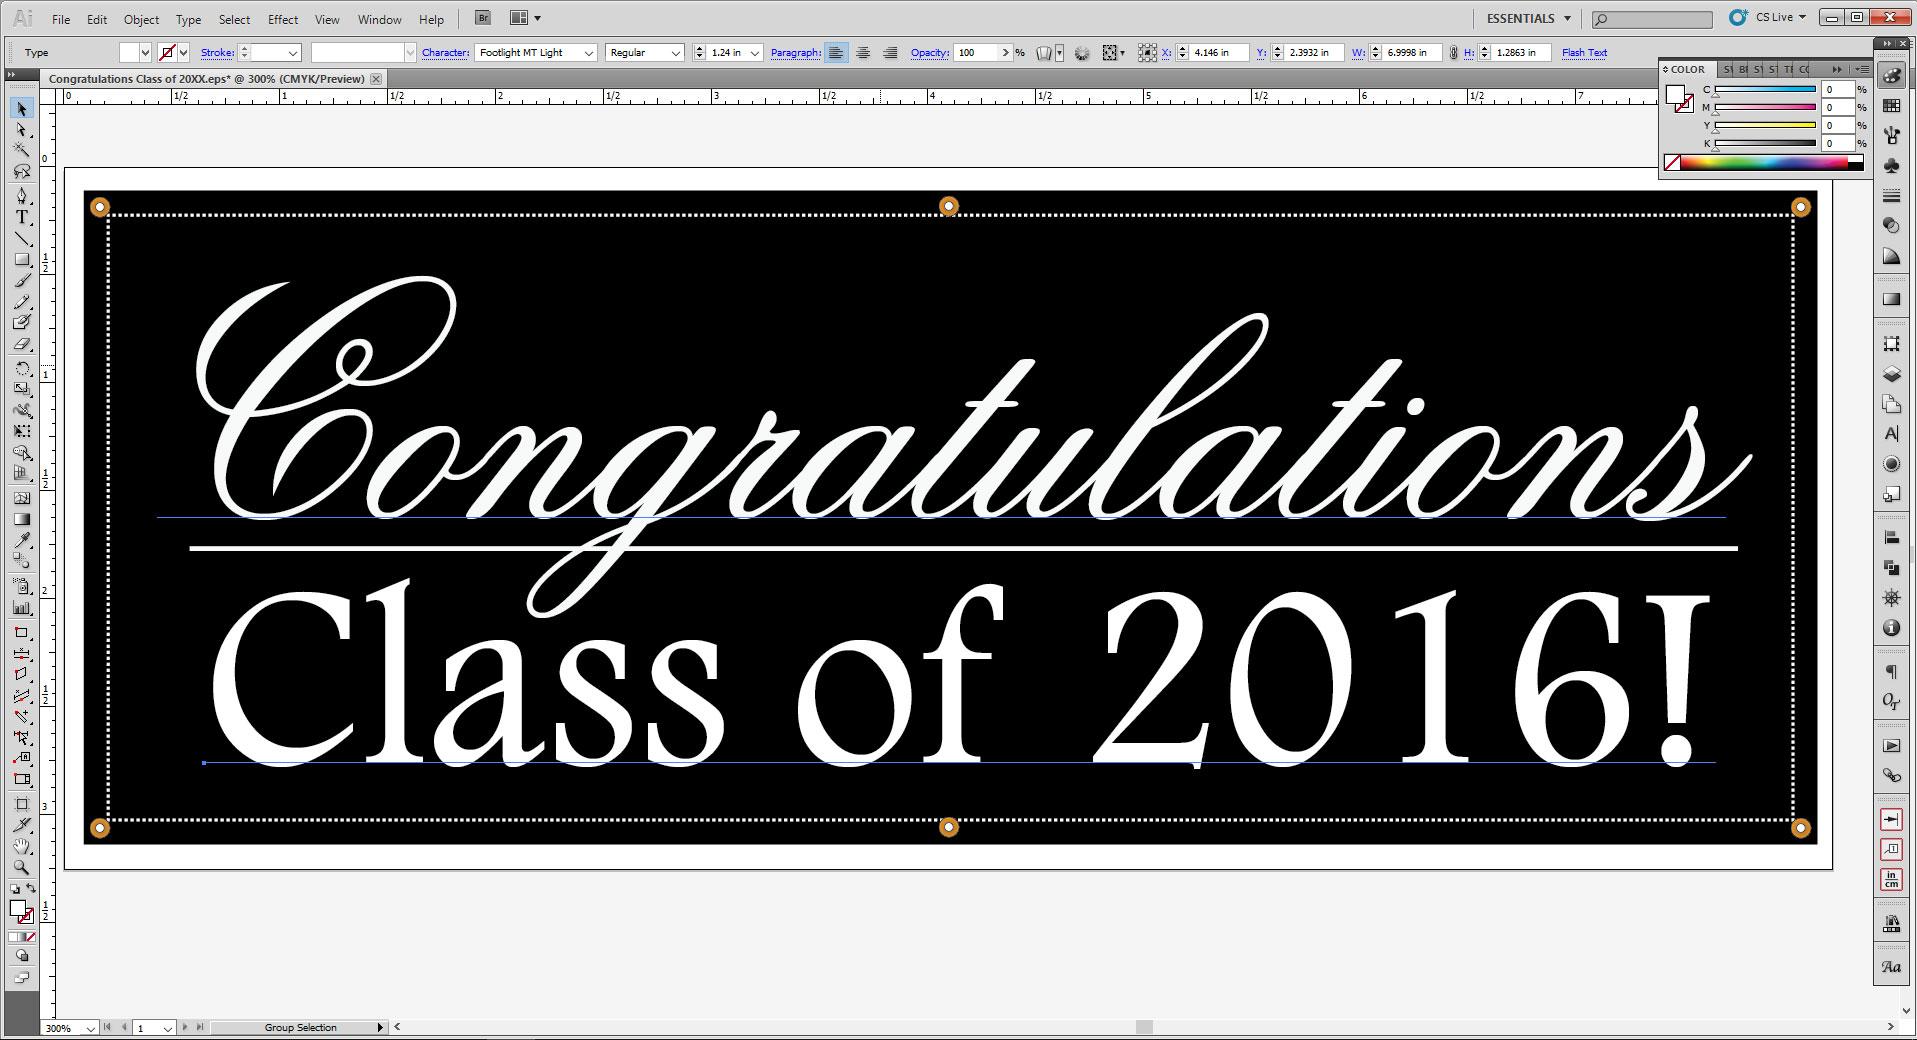 Custom-Sign-Design-Graduation-image